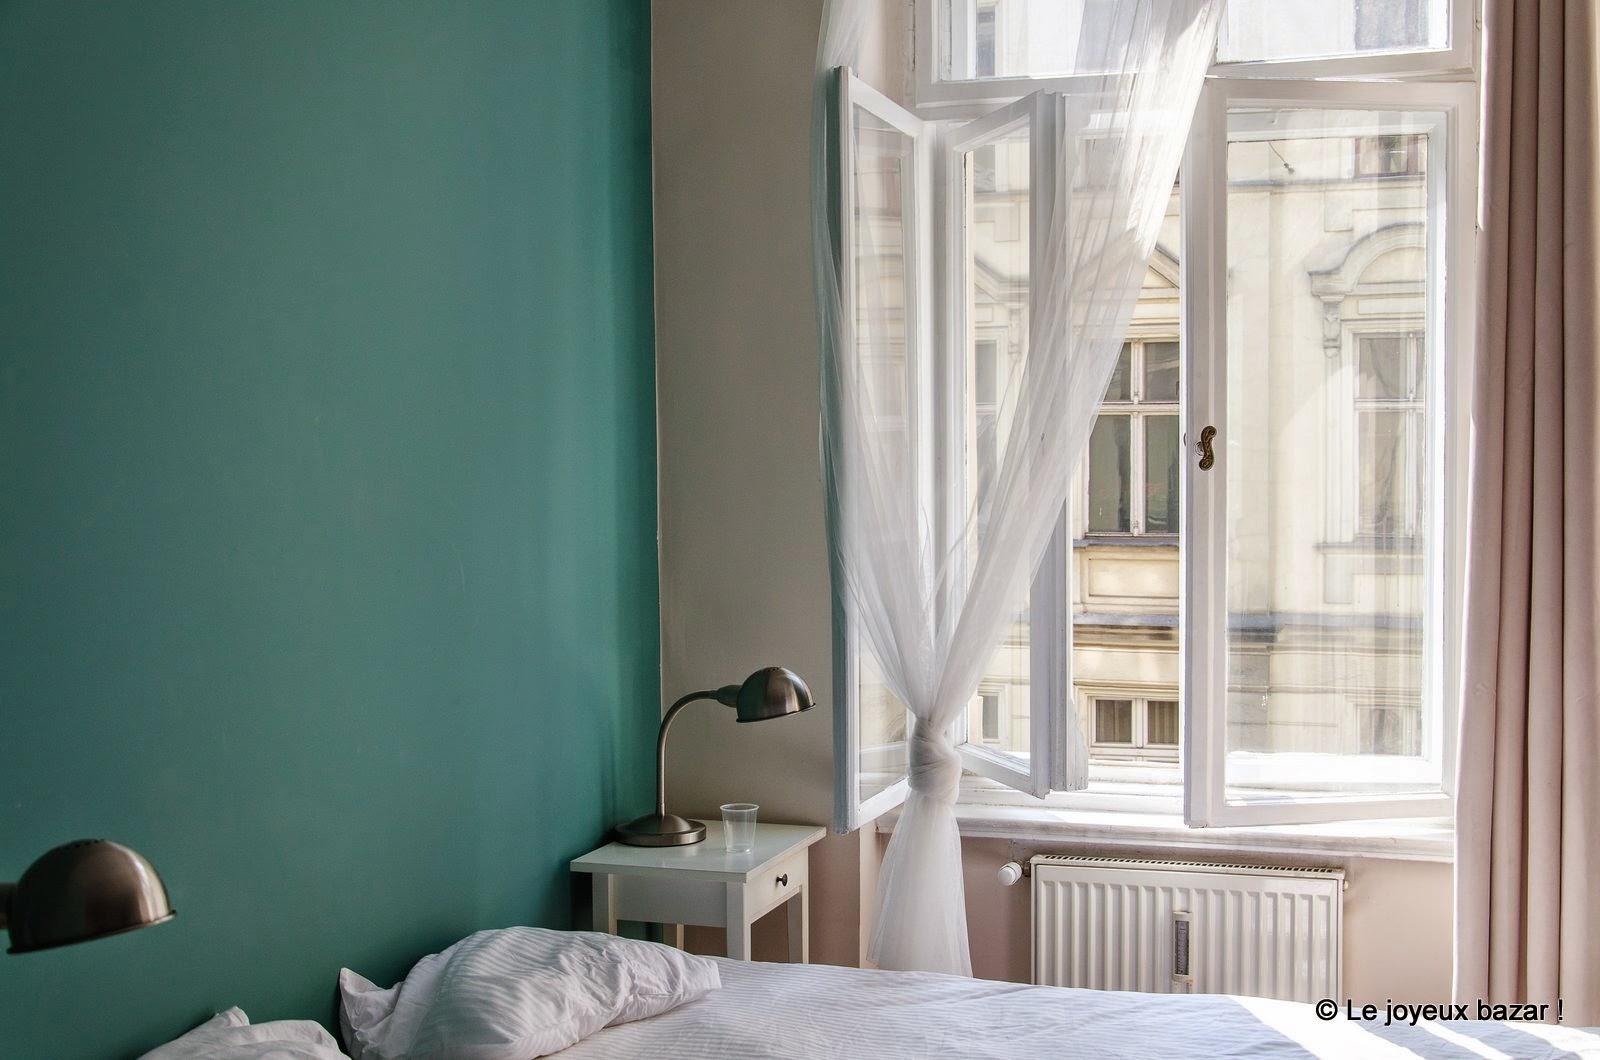 Poznan - blooms inn hotel